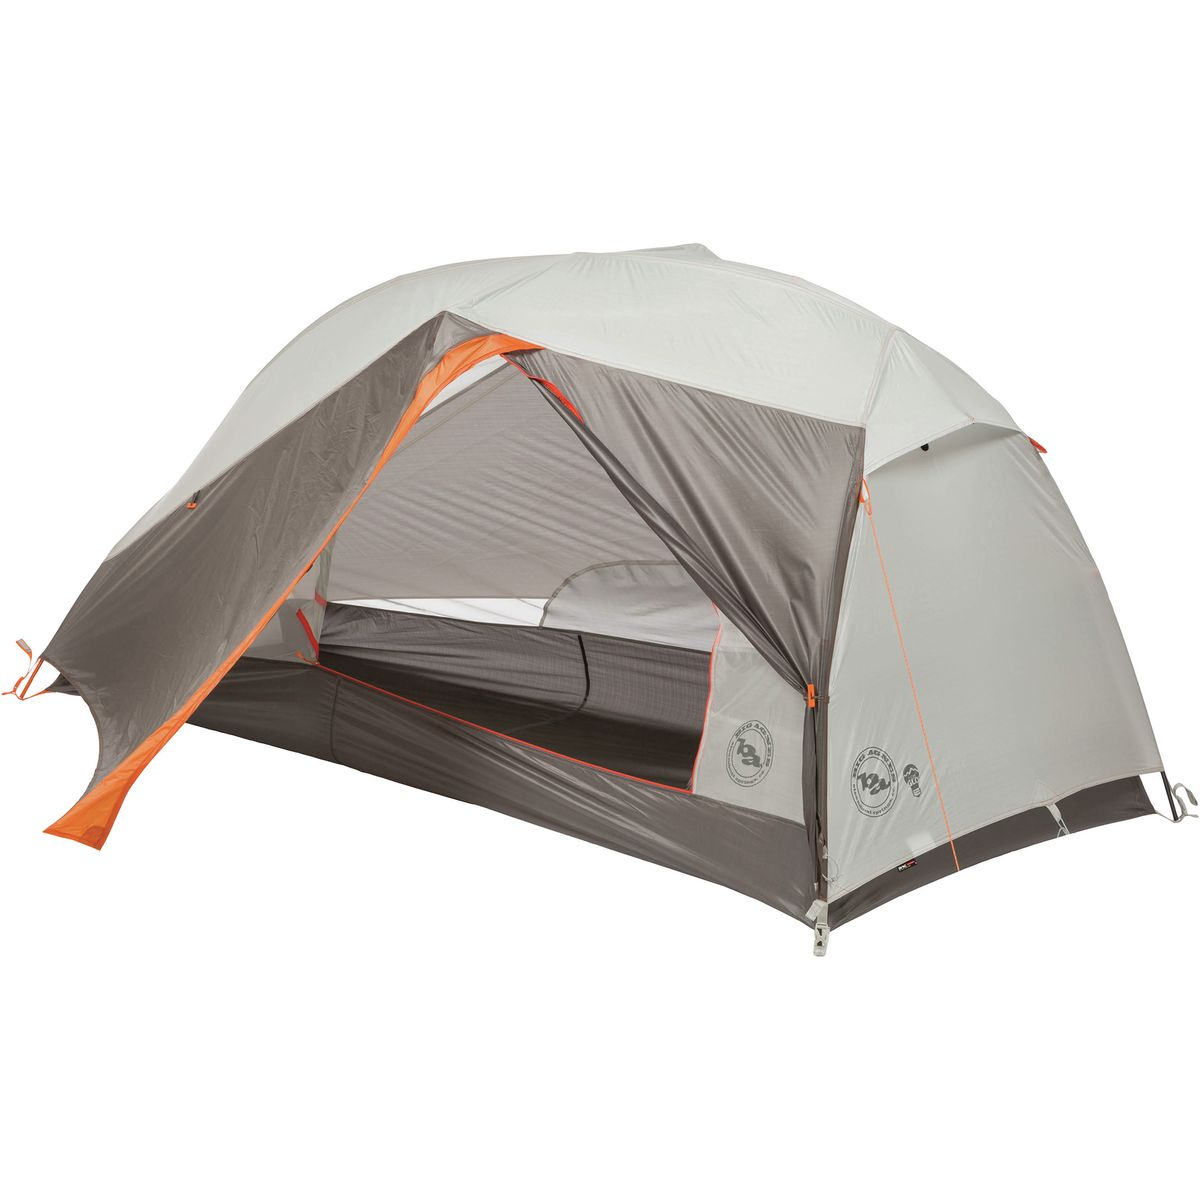 Big Agnes Copper Spur HV UL 1 mtnGLO Tent: 1-Person 3-Season Silver/Gray, One Size